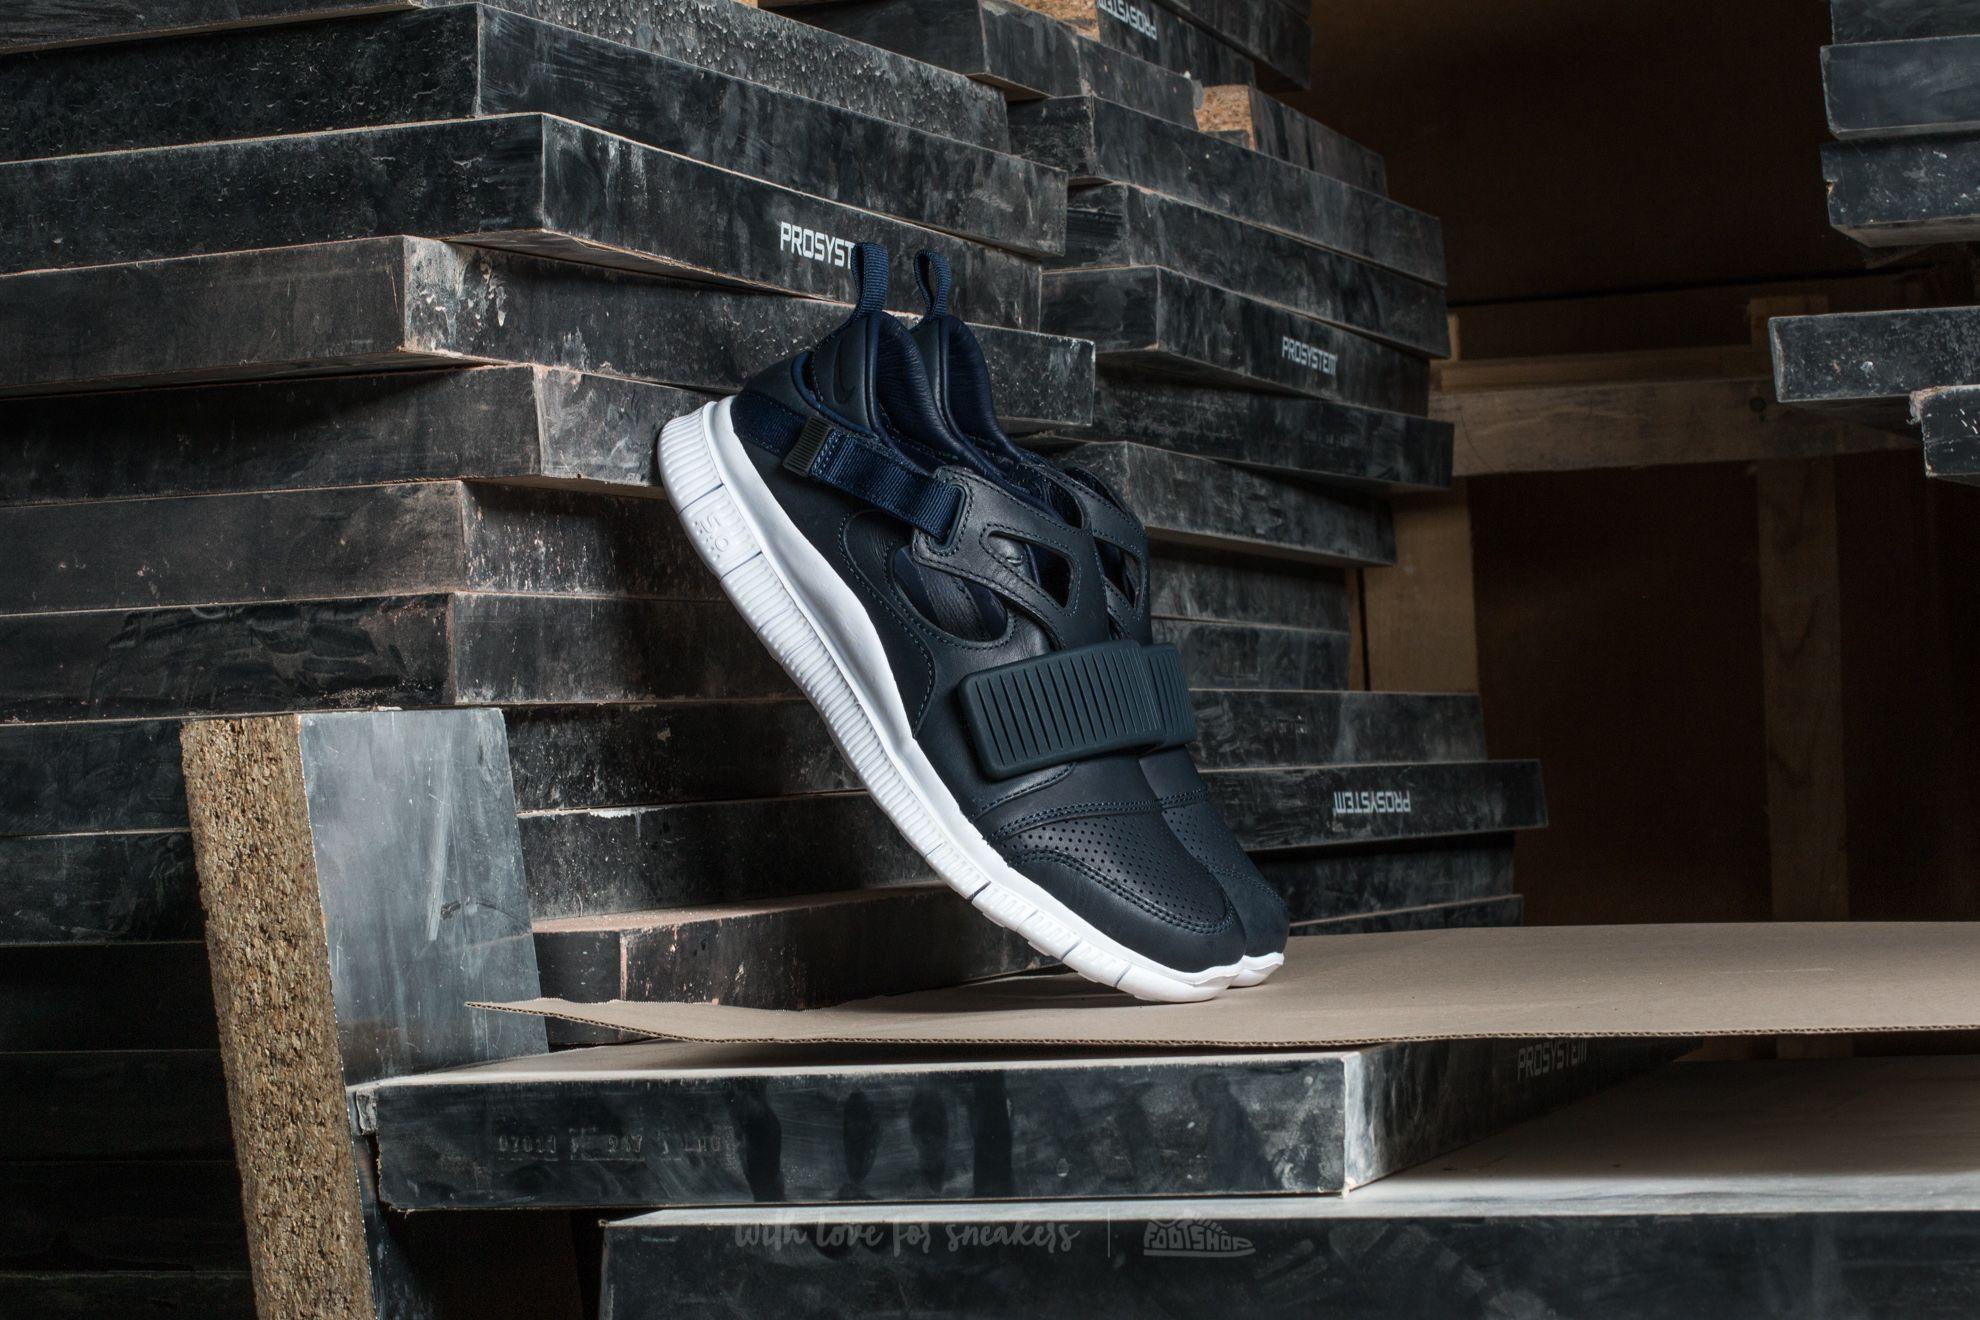 098c401d6a43 Nike Free Huarache Carnivore SP Obsidian  White-Catalina-Black ...